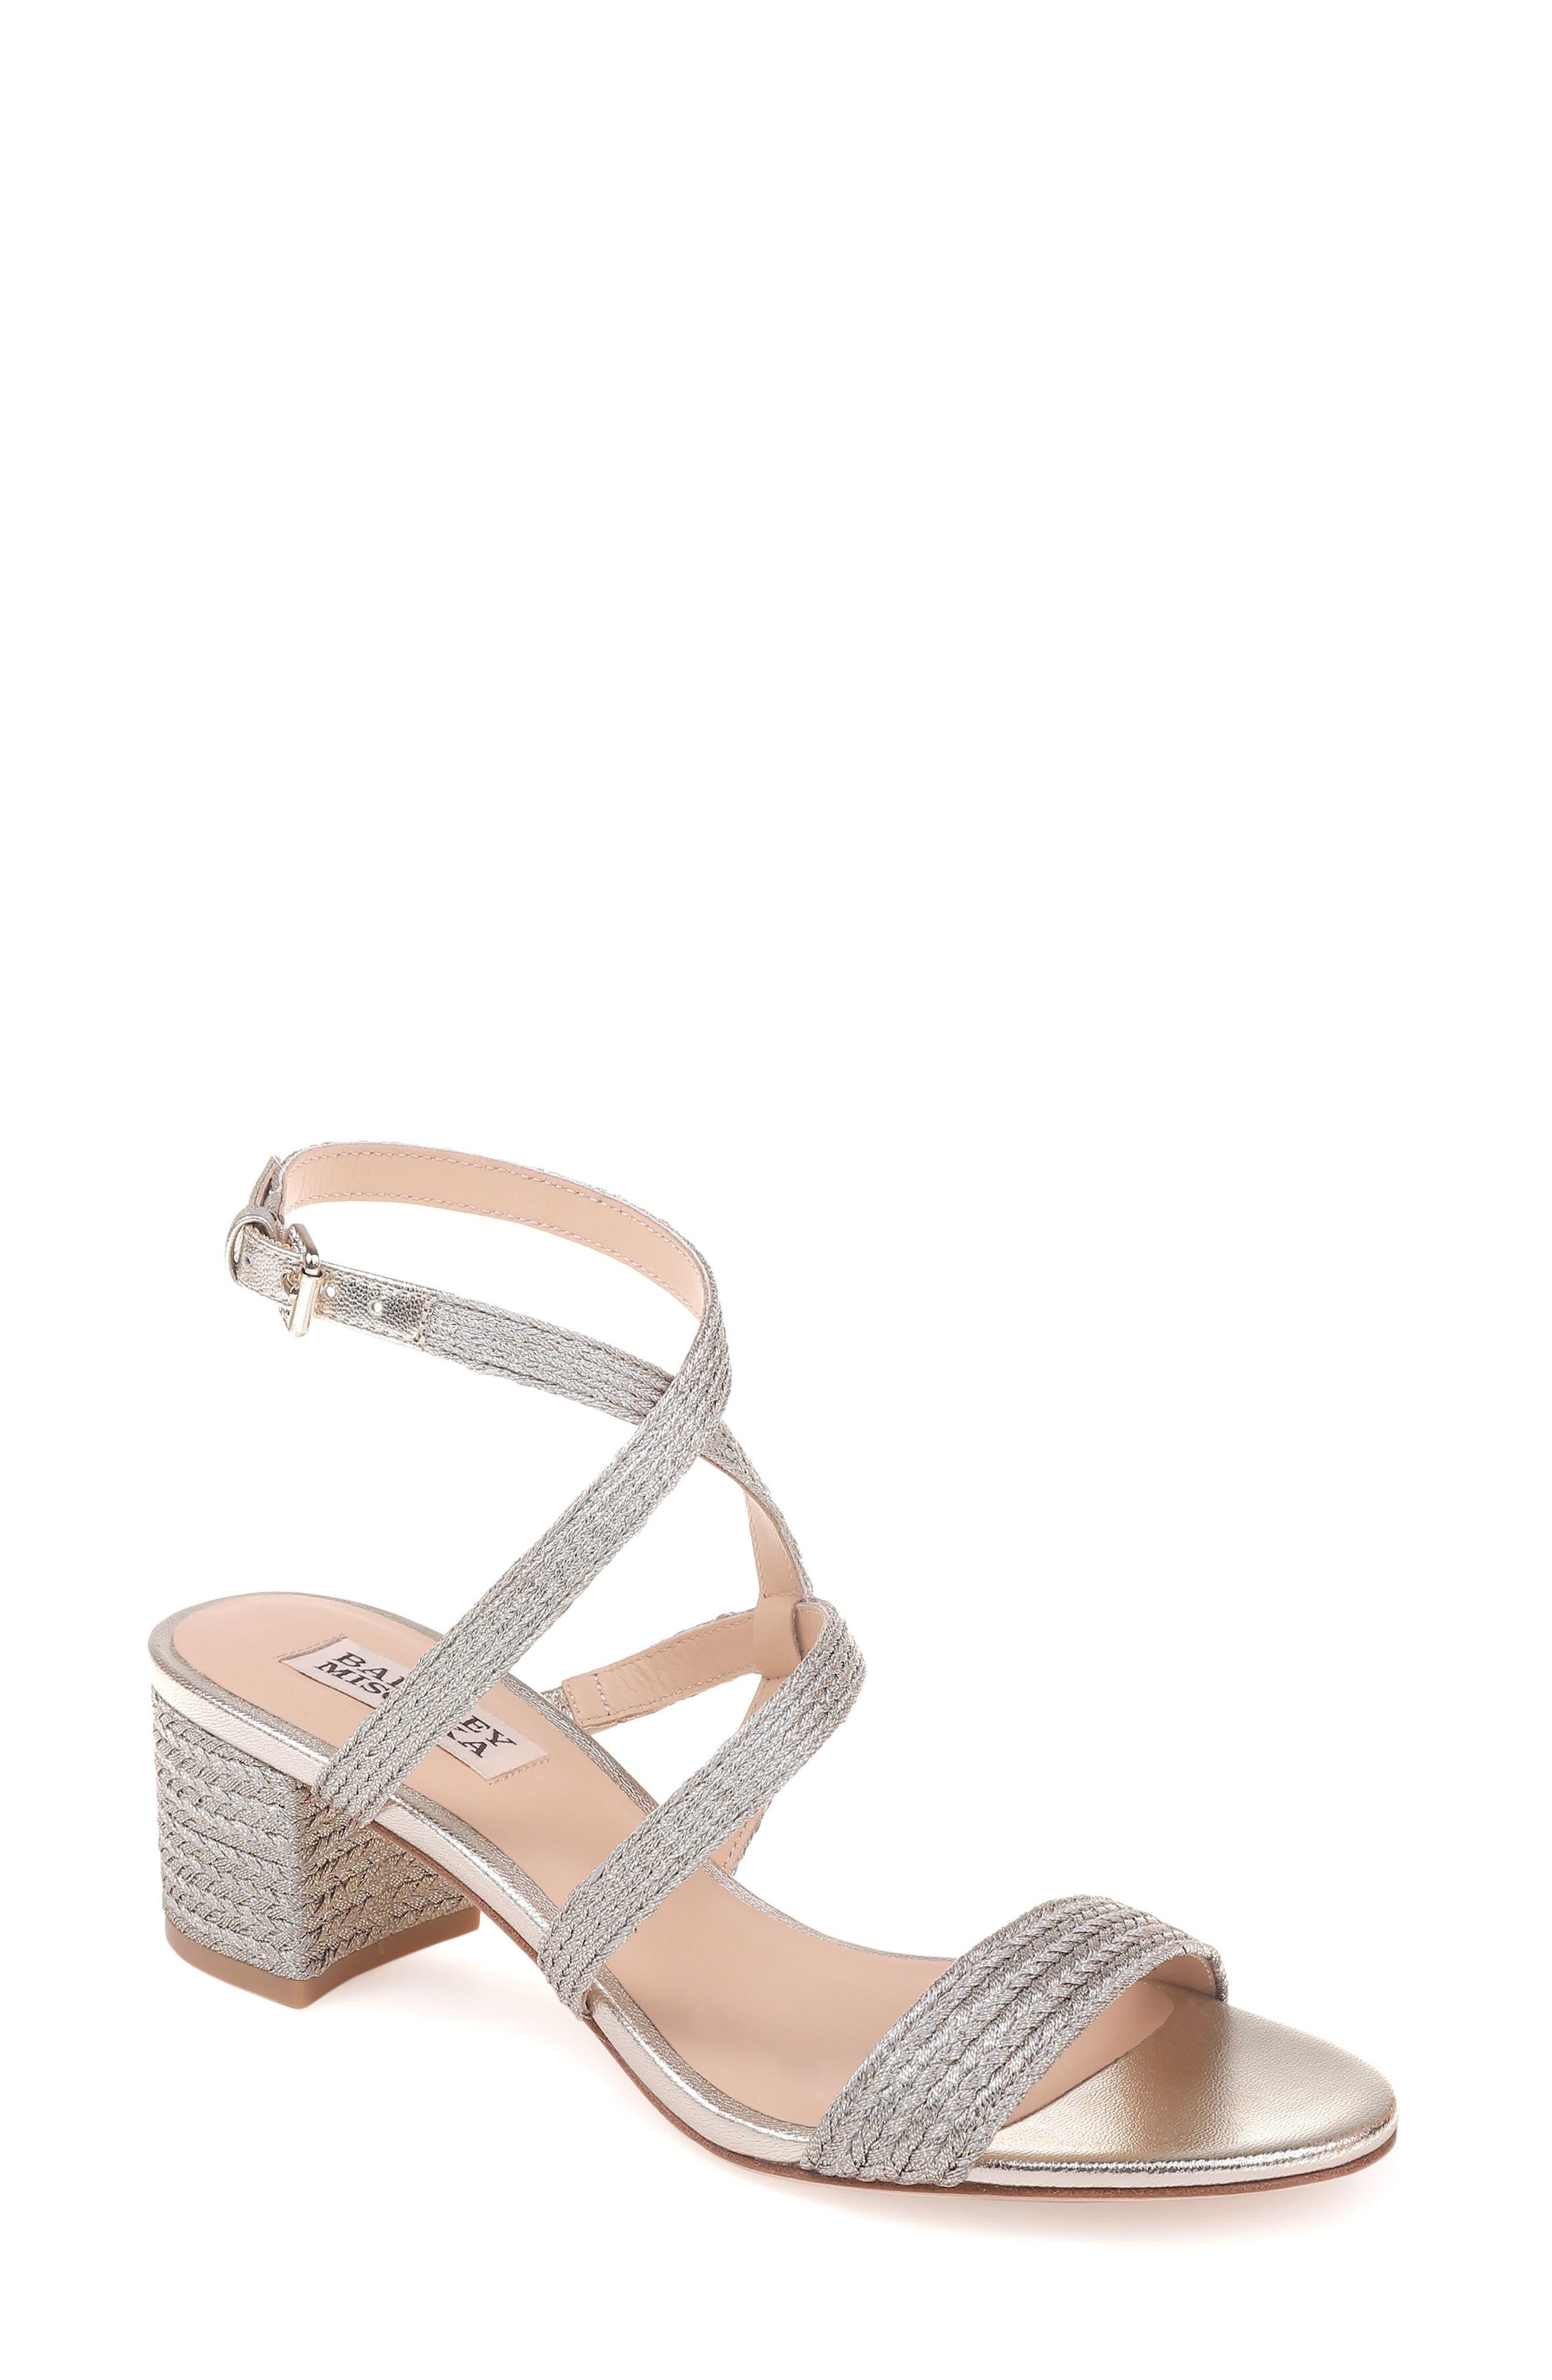 Storm Block Heel Sandal,                         Main,                         color, Platino Fabric